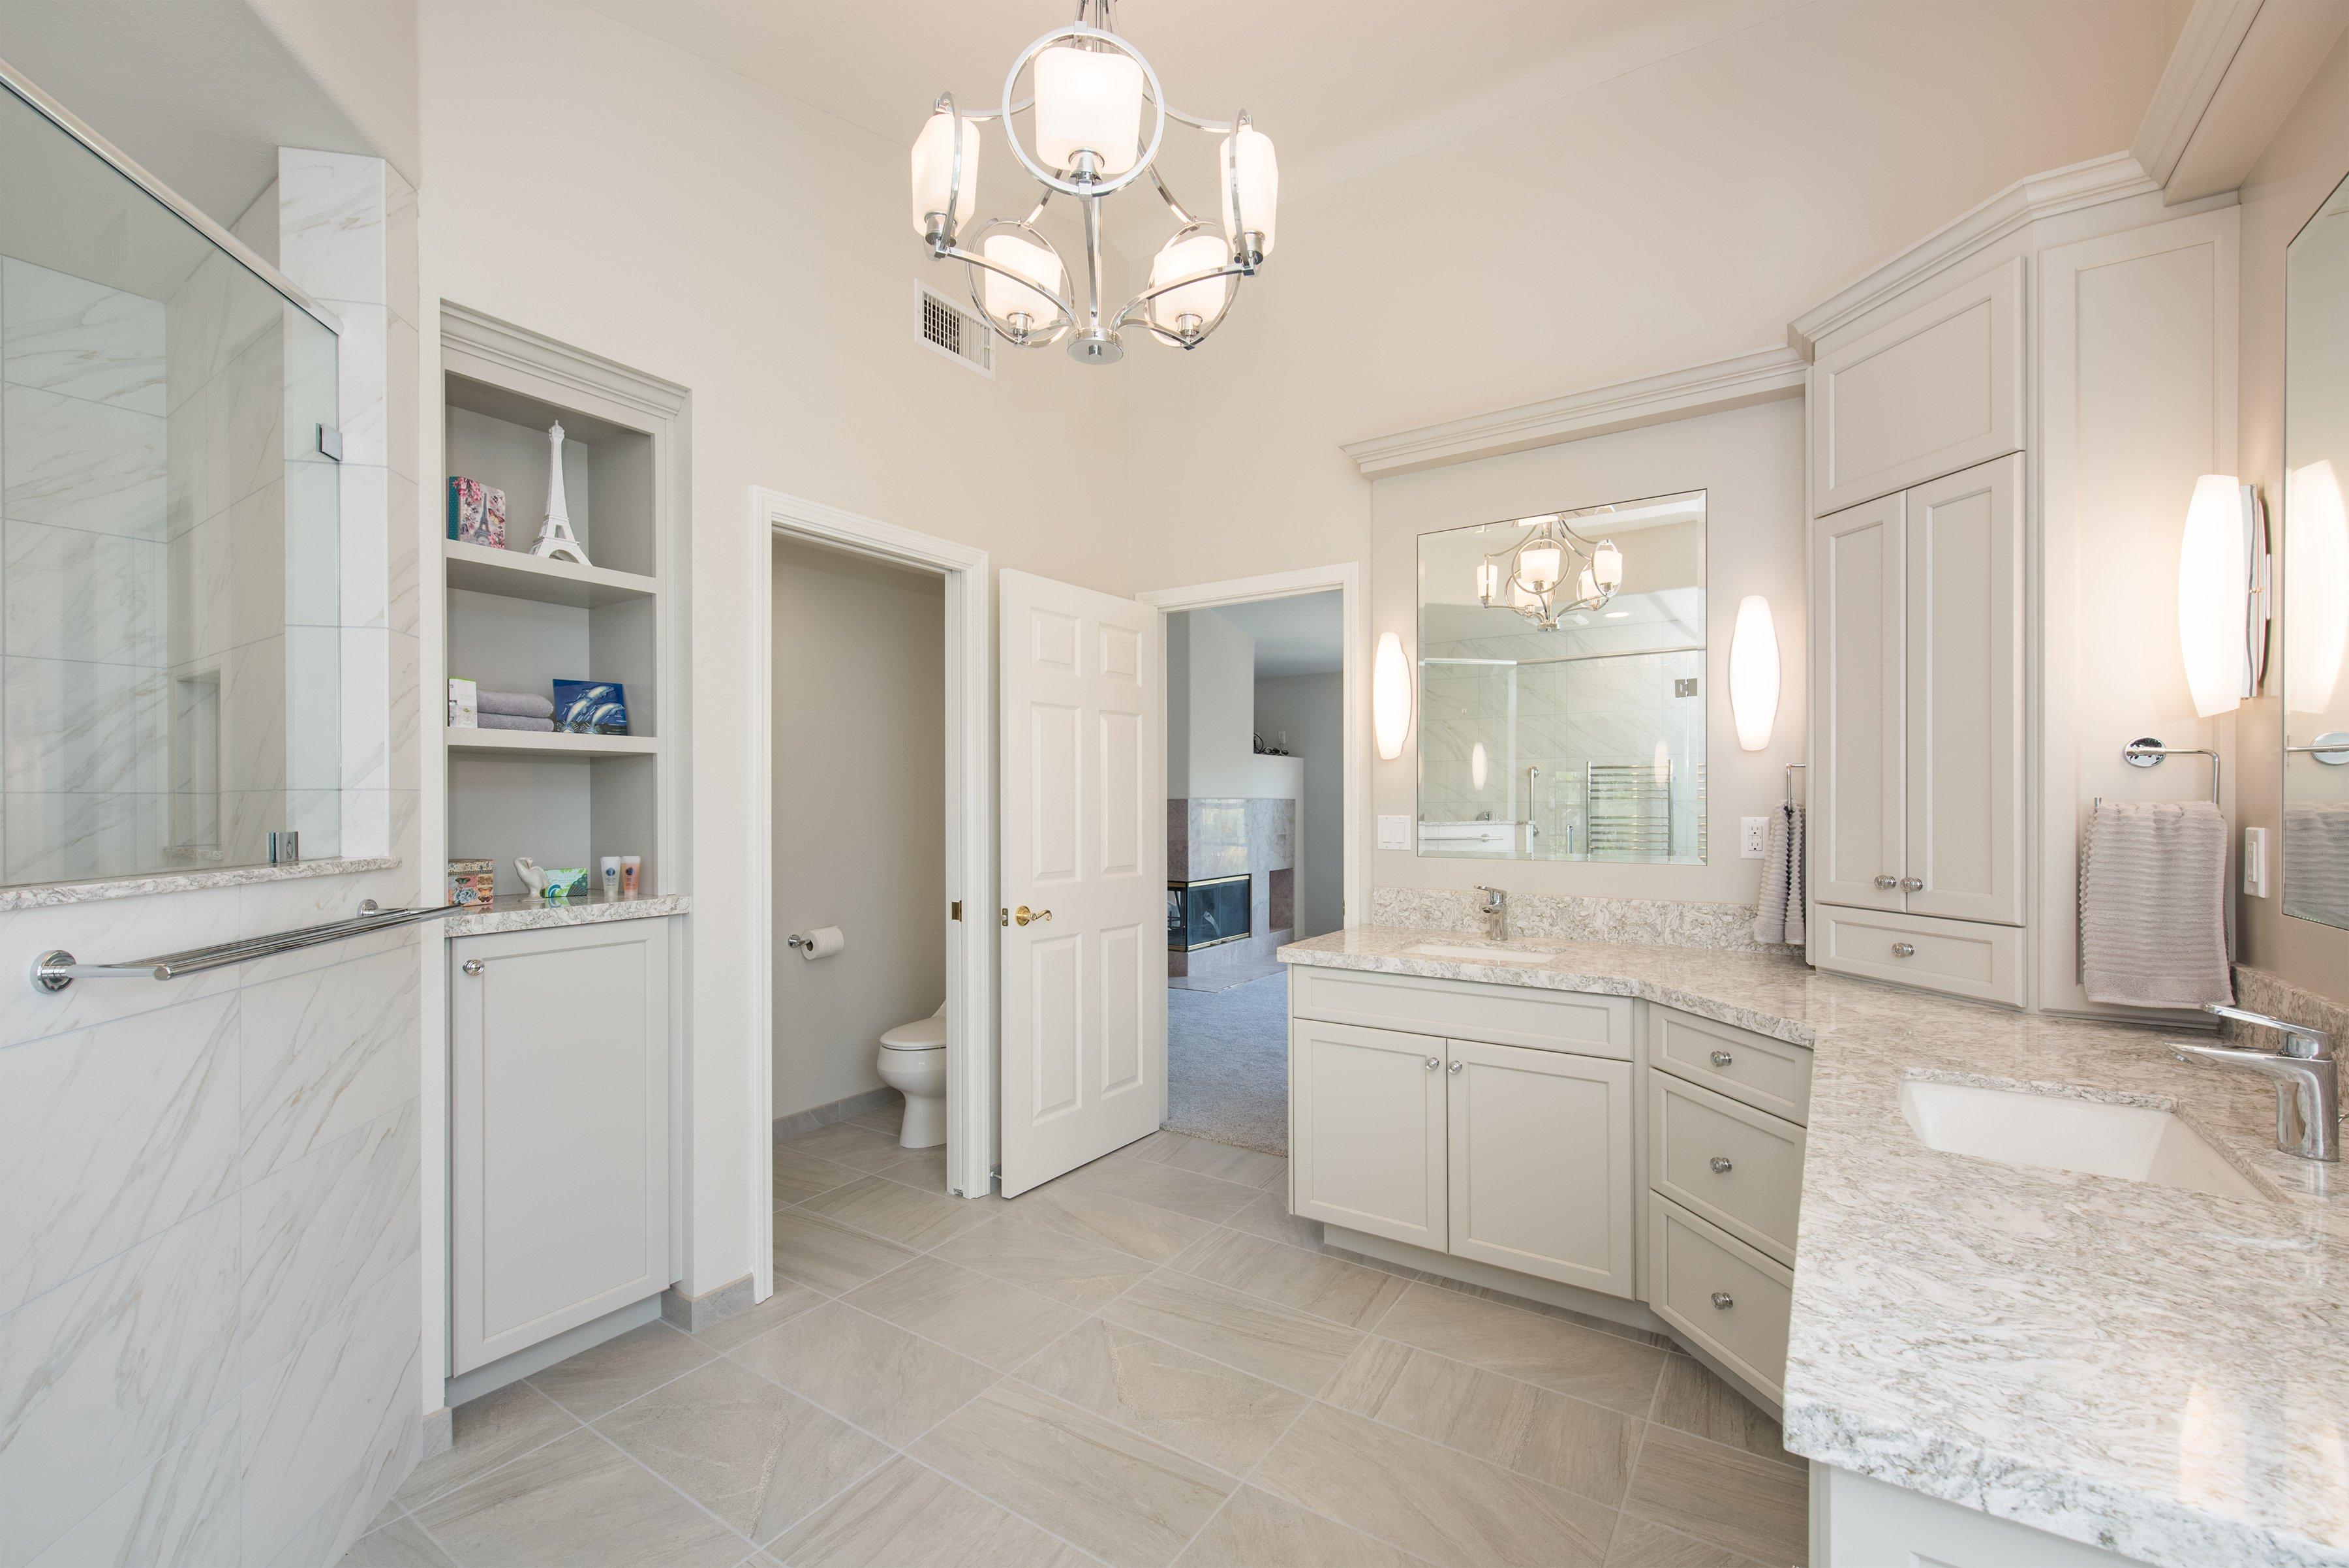 yorba linda bathroom remodel – kohorn - burgin design • remodel